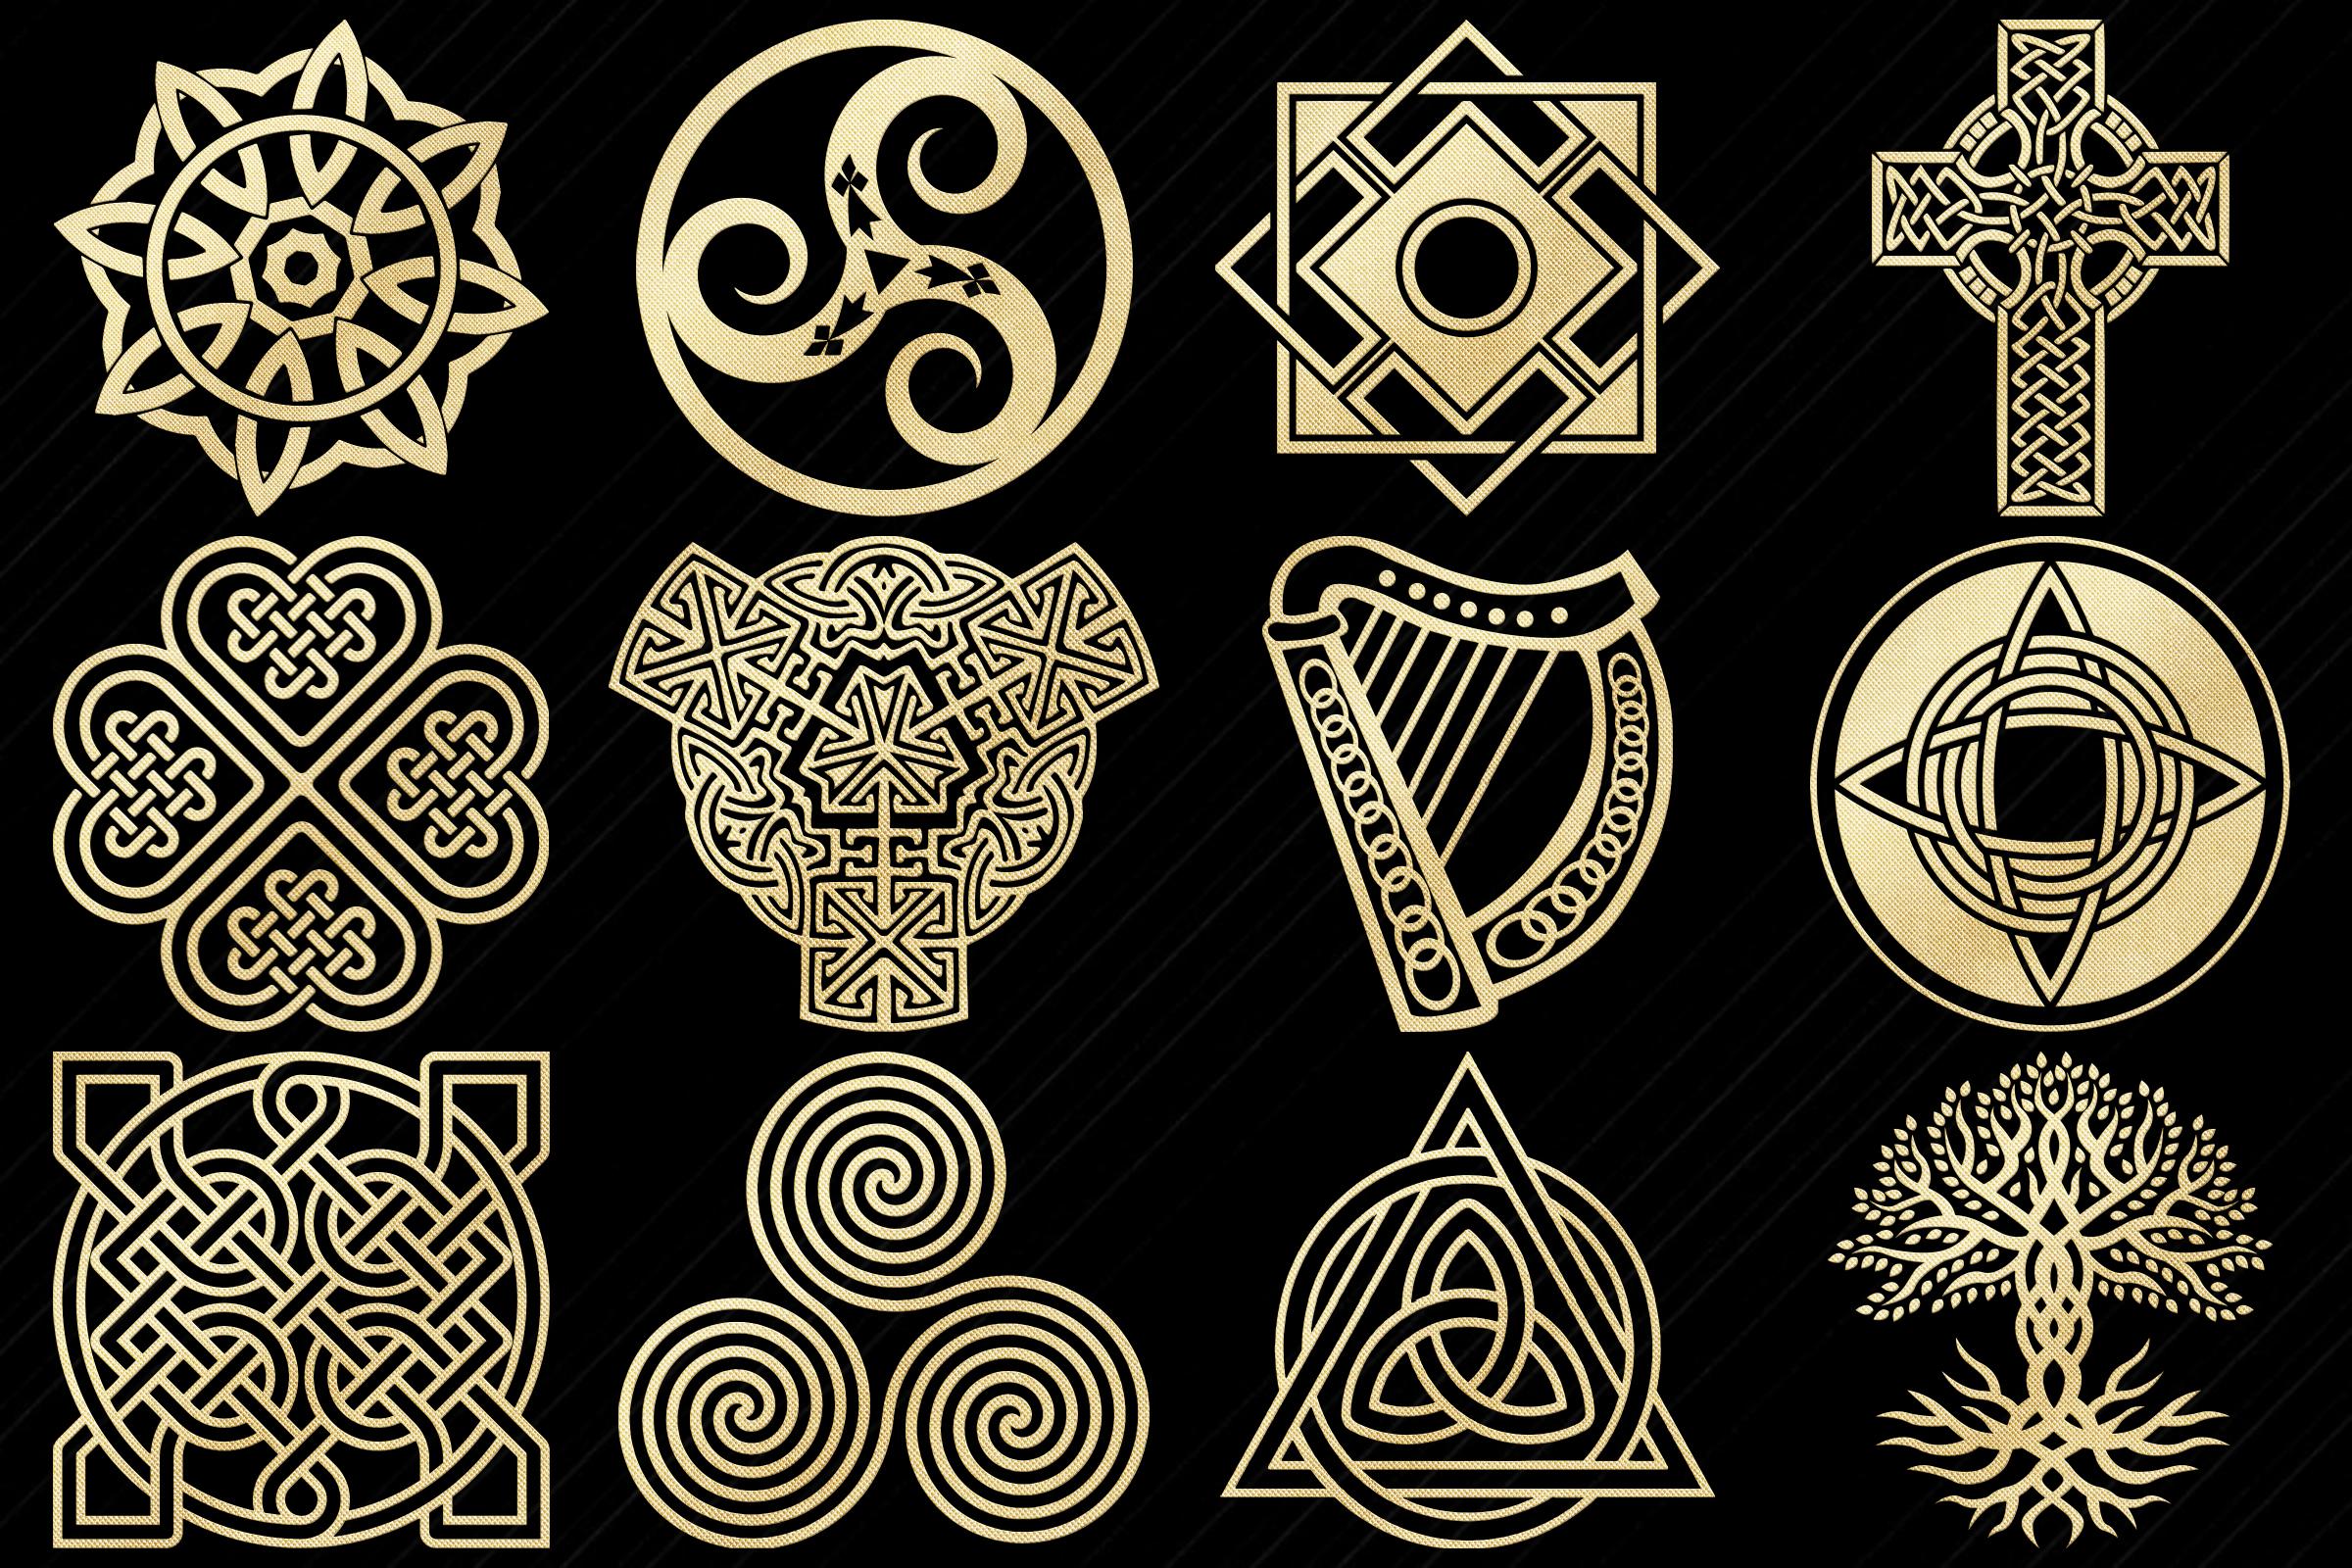 Gold Foil Celtic Symbols, Knots, Crosses Clip Art example image 2